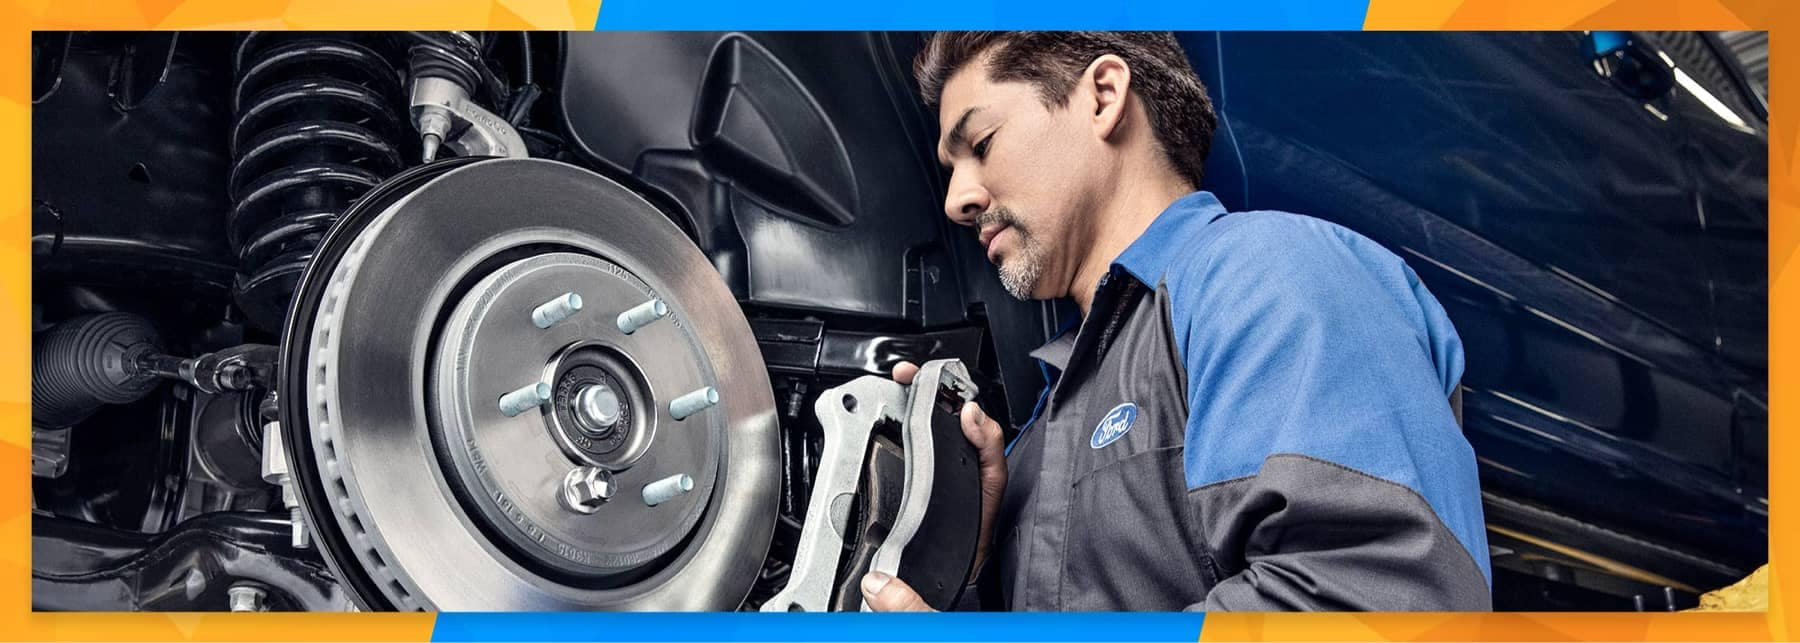 Ford Commercial Trucks - service technician adjusting breaks